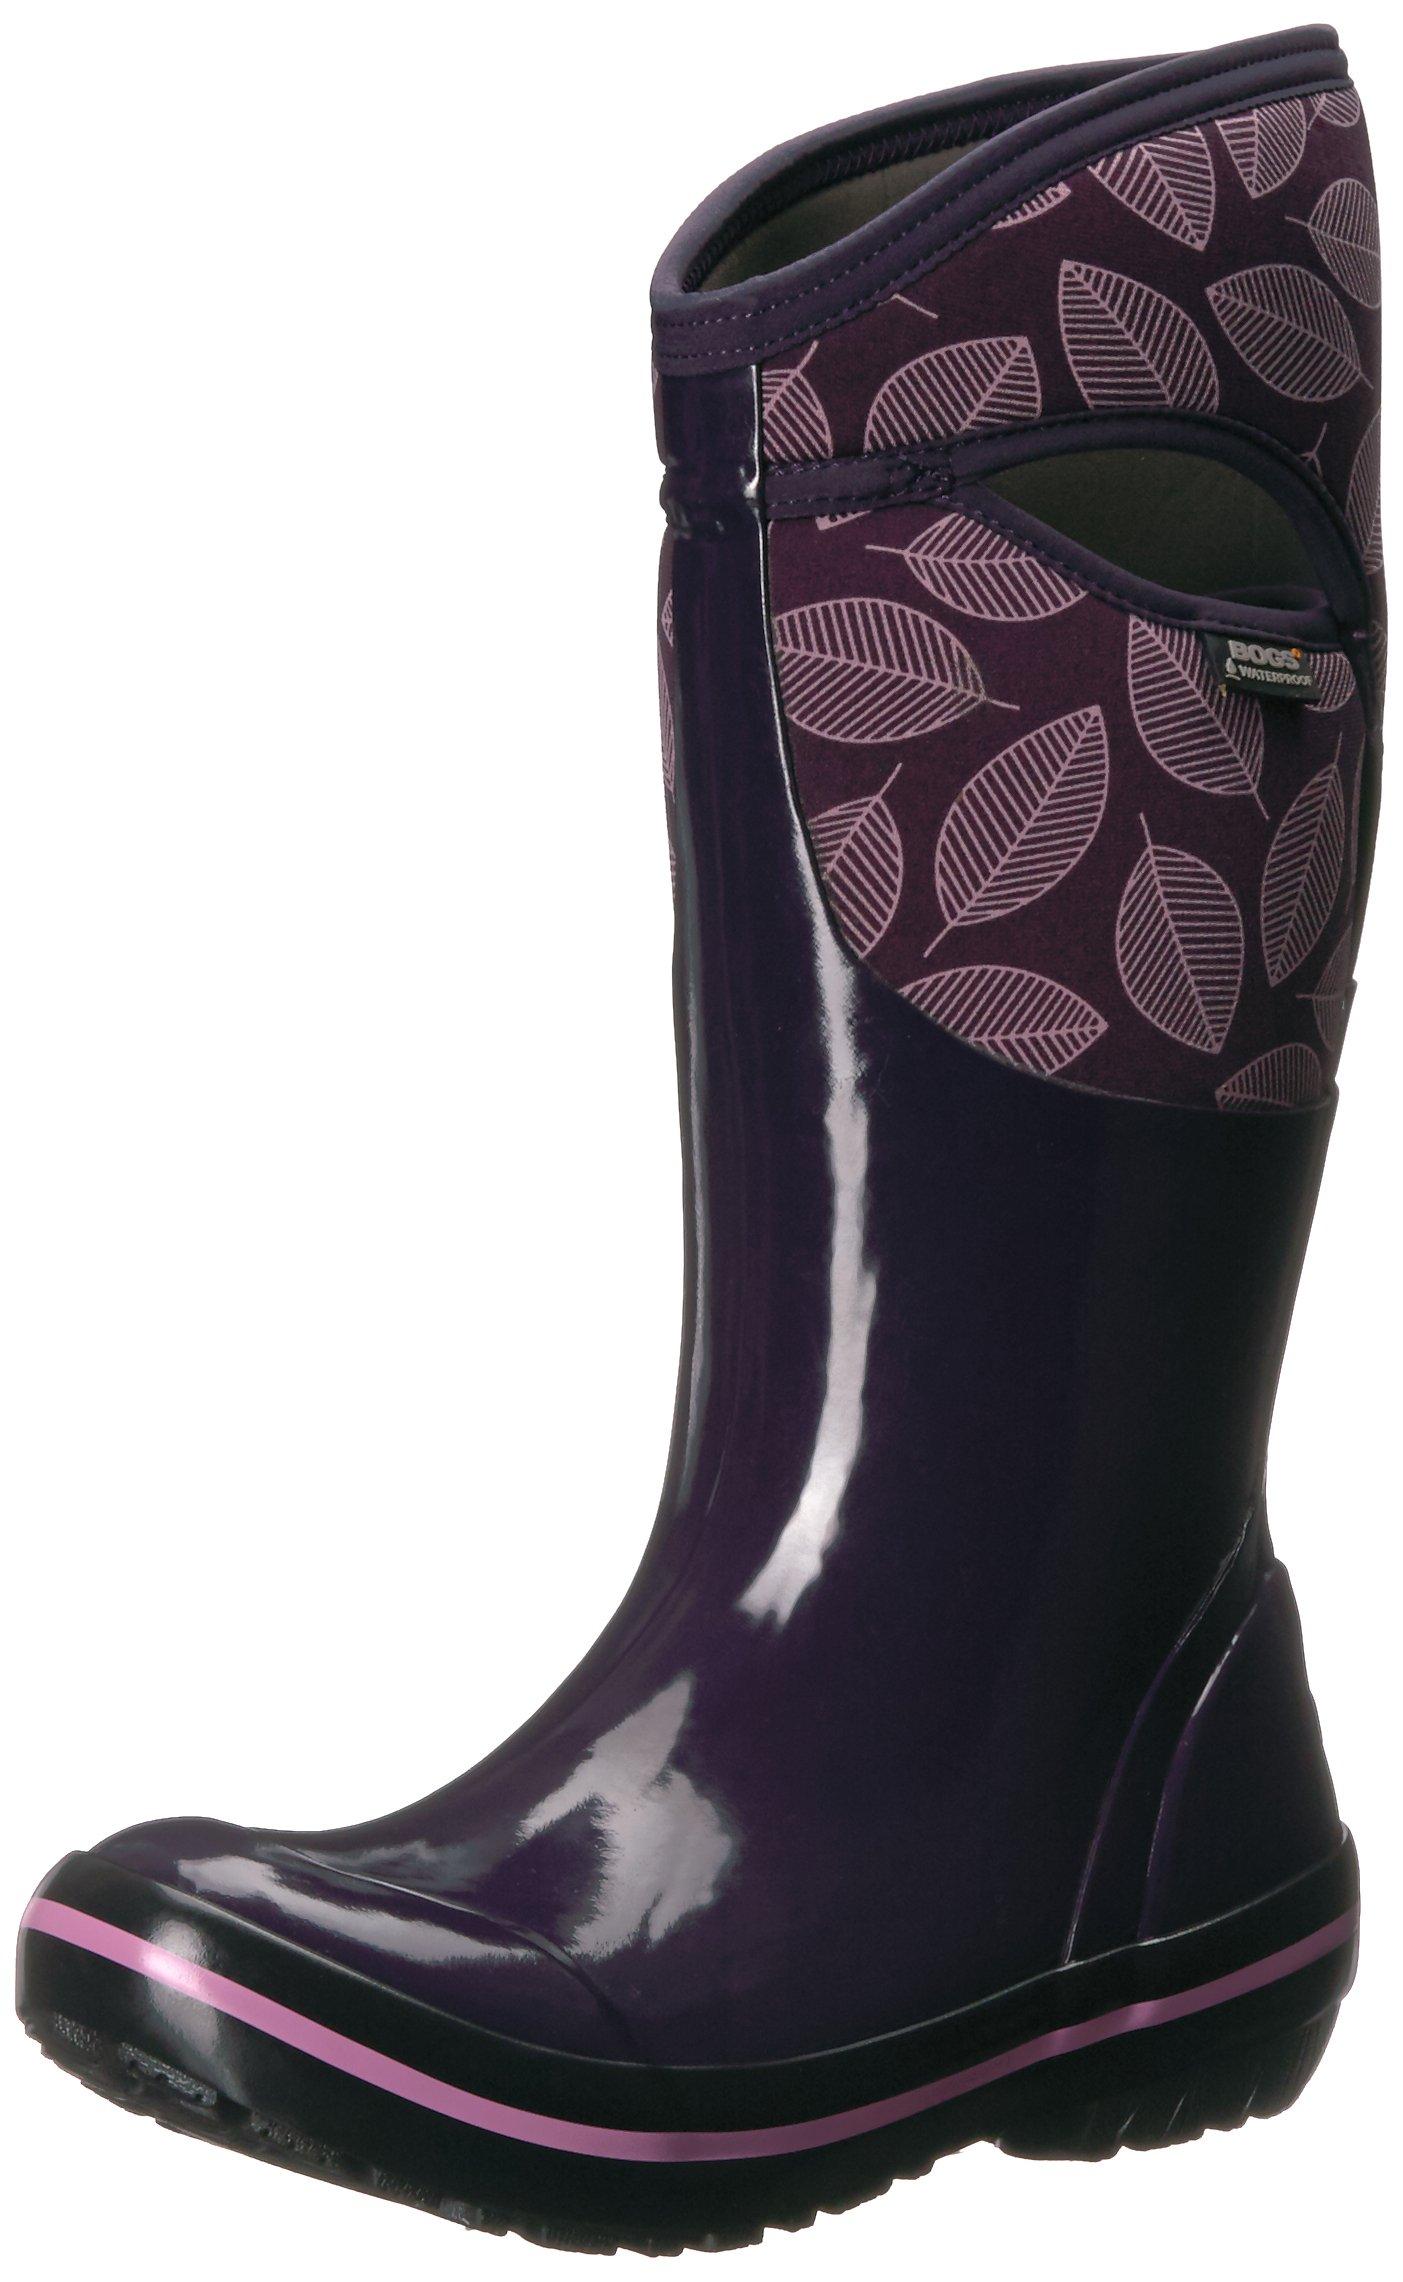 Bogs Women's Plimsoll Leafy Tall Snow Boot, Eggplant Multi, 11 M US